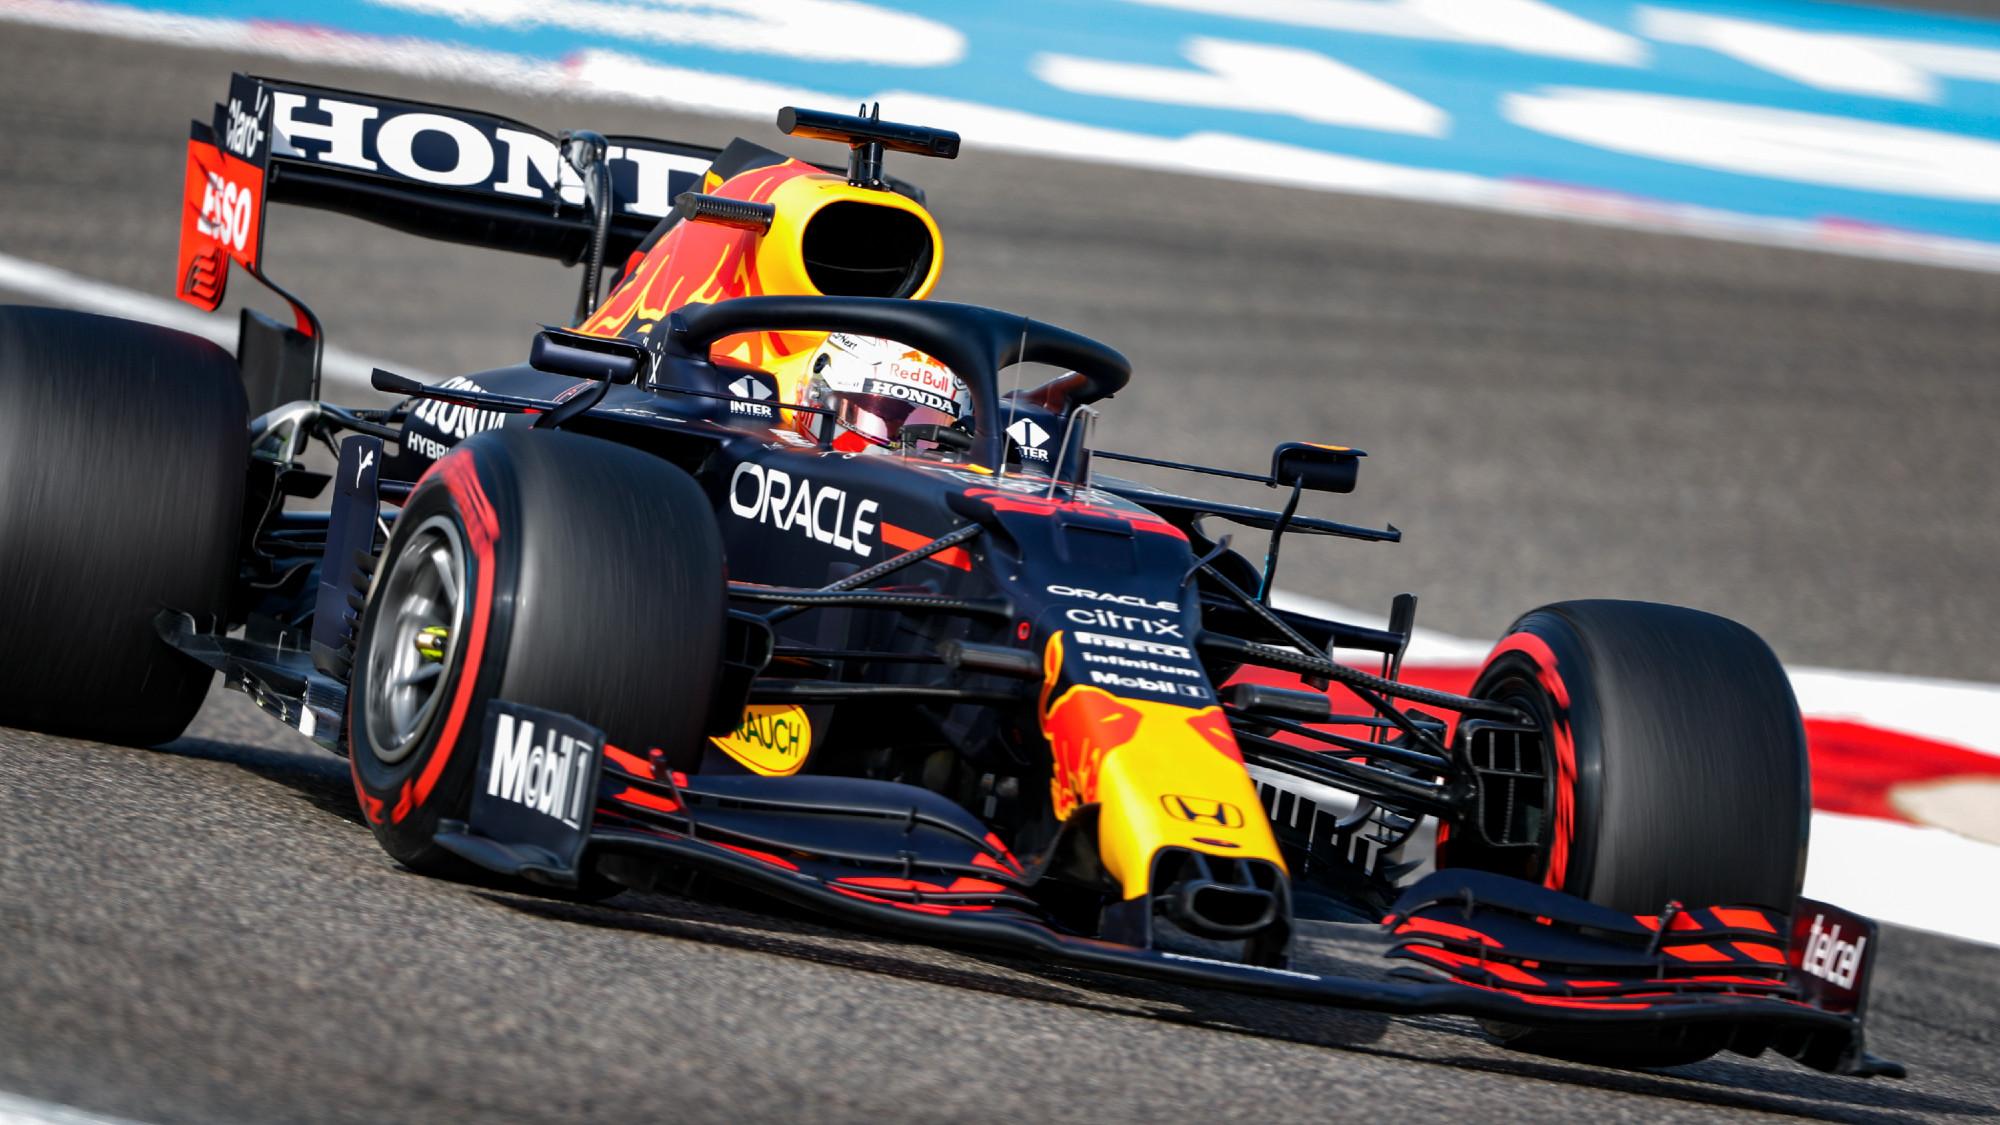 Max Verstappen dominates practice for 2021 F1 Bahrain GP